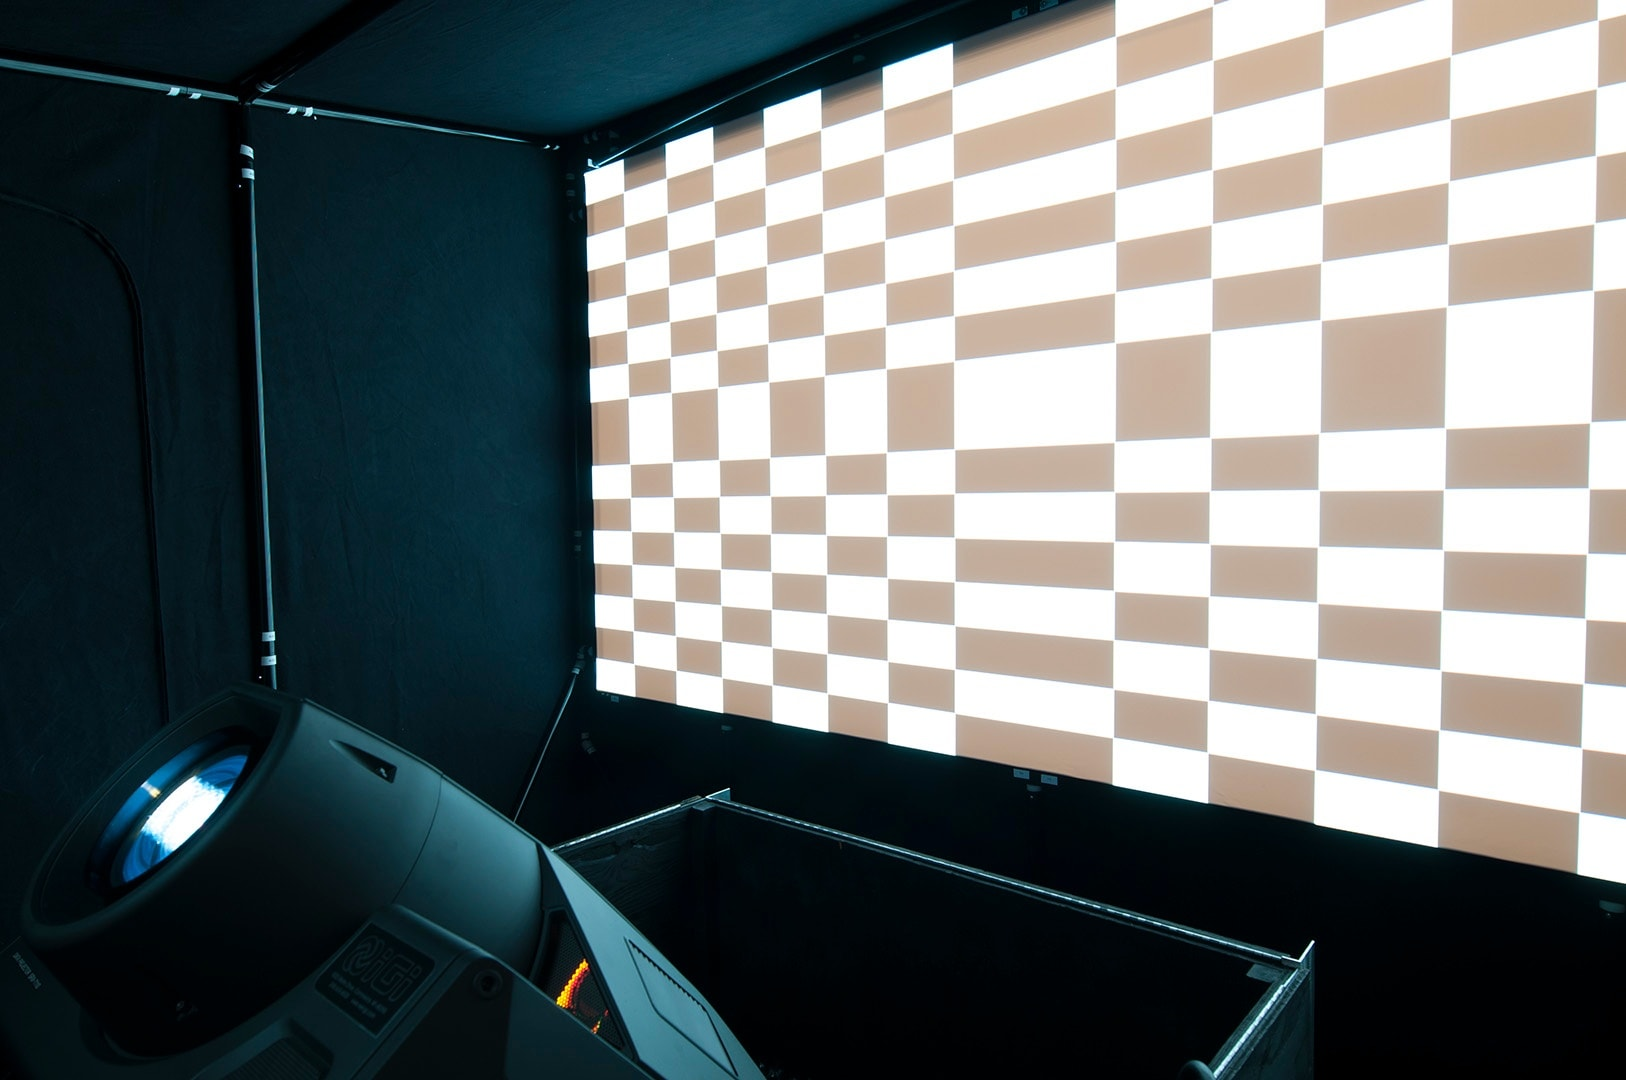 IGI PowerWindow projection systems equipment install